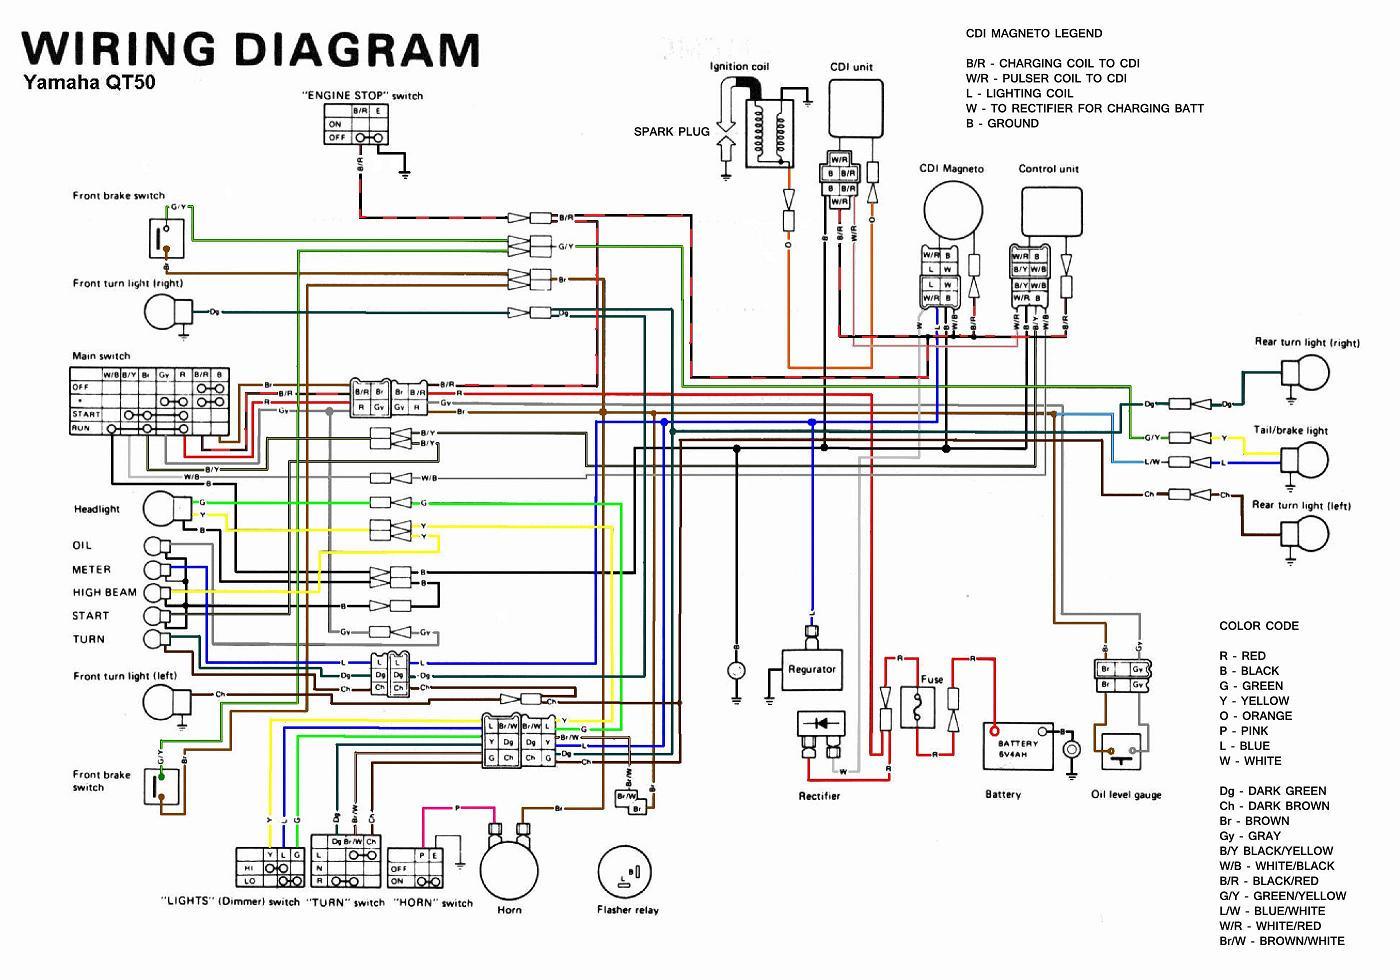 Yamaha QT50 Wiring Diagram?resize=640%2C448 1977 yamaha dt 250 wiring diagram hobbiesxstyle yamaha 1978 dt 125 wiring diagram at nearapp.co